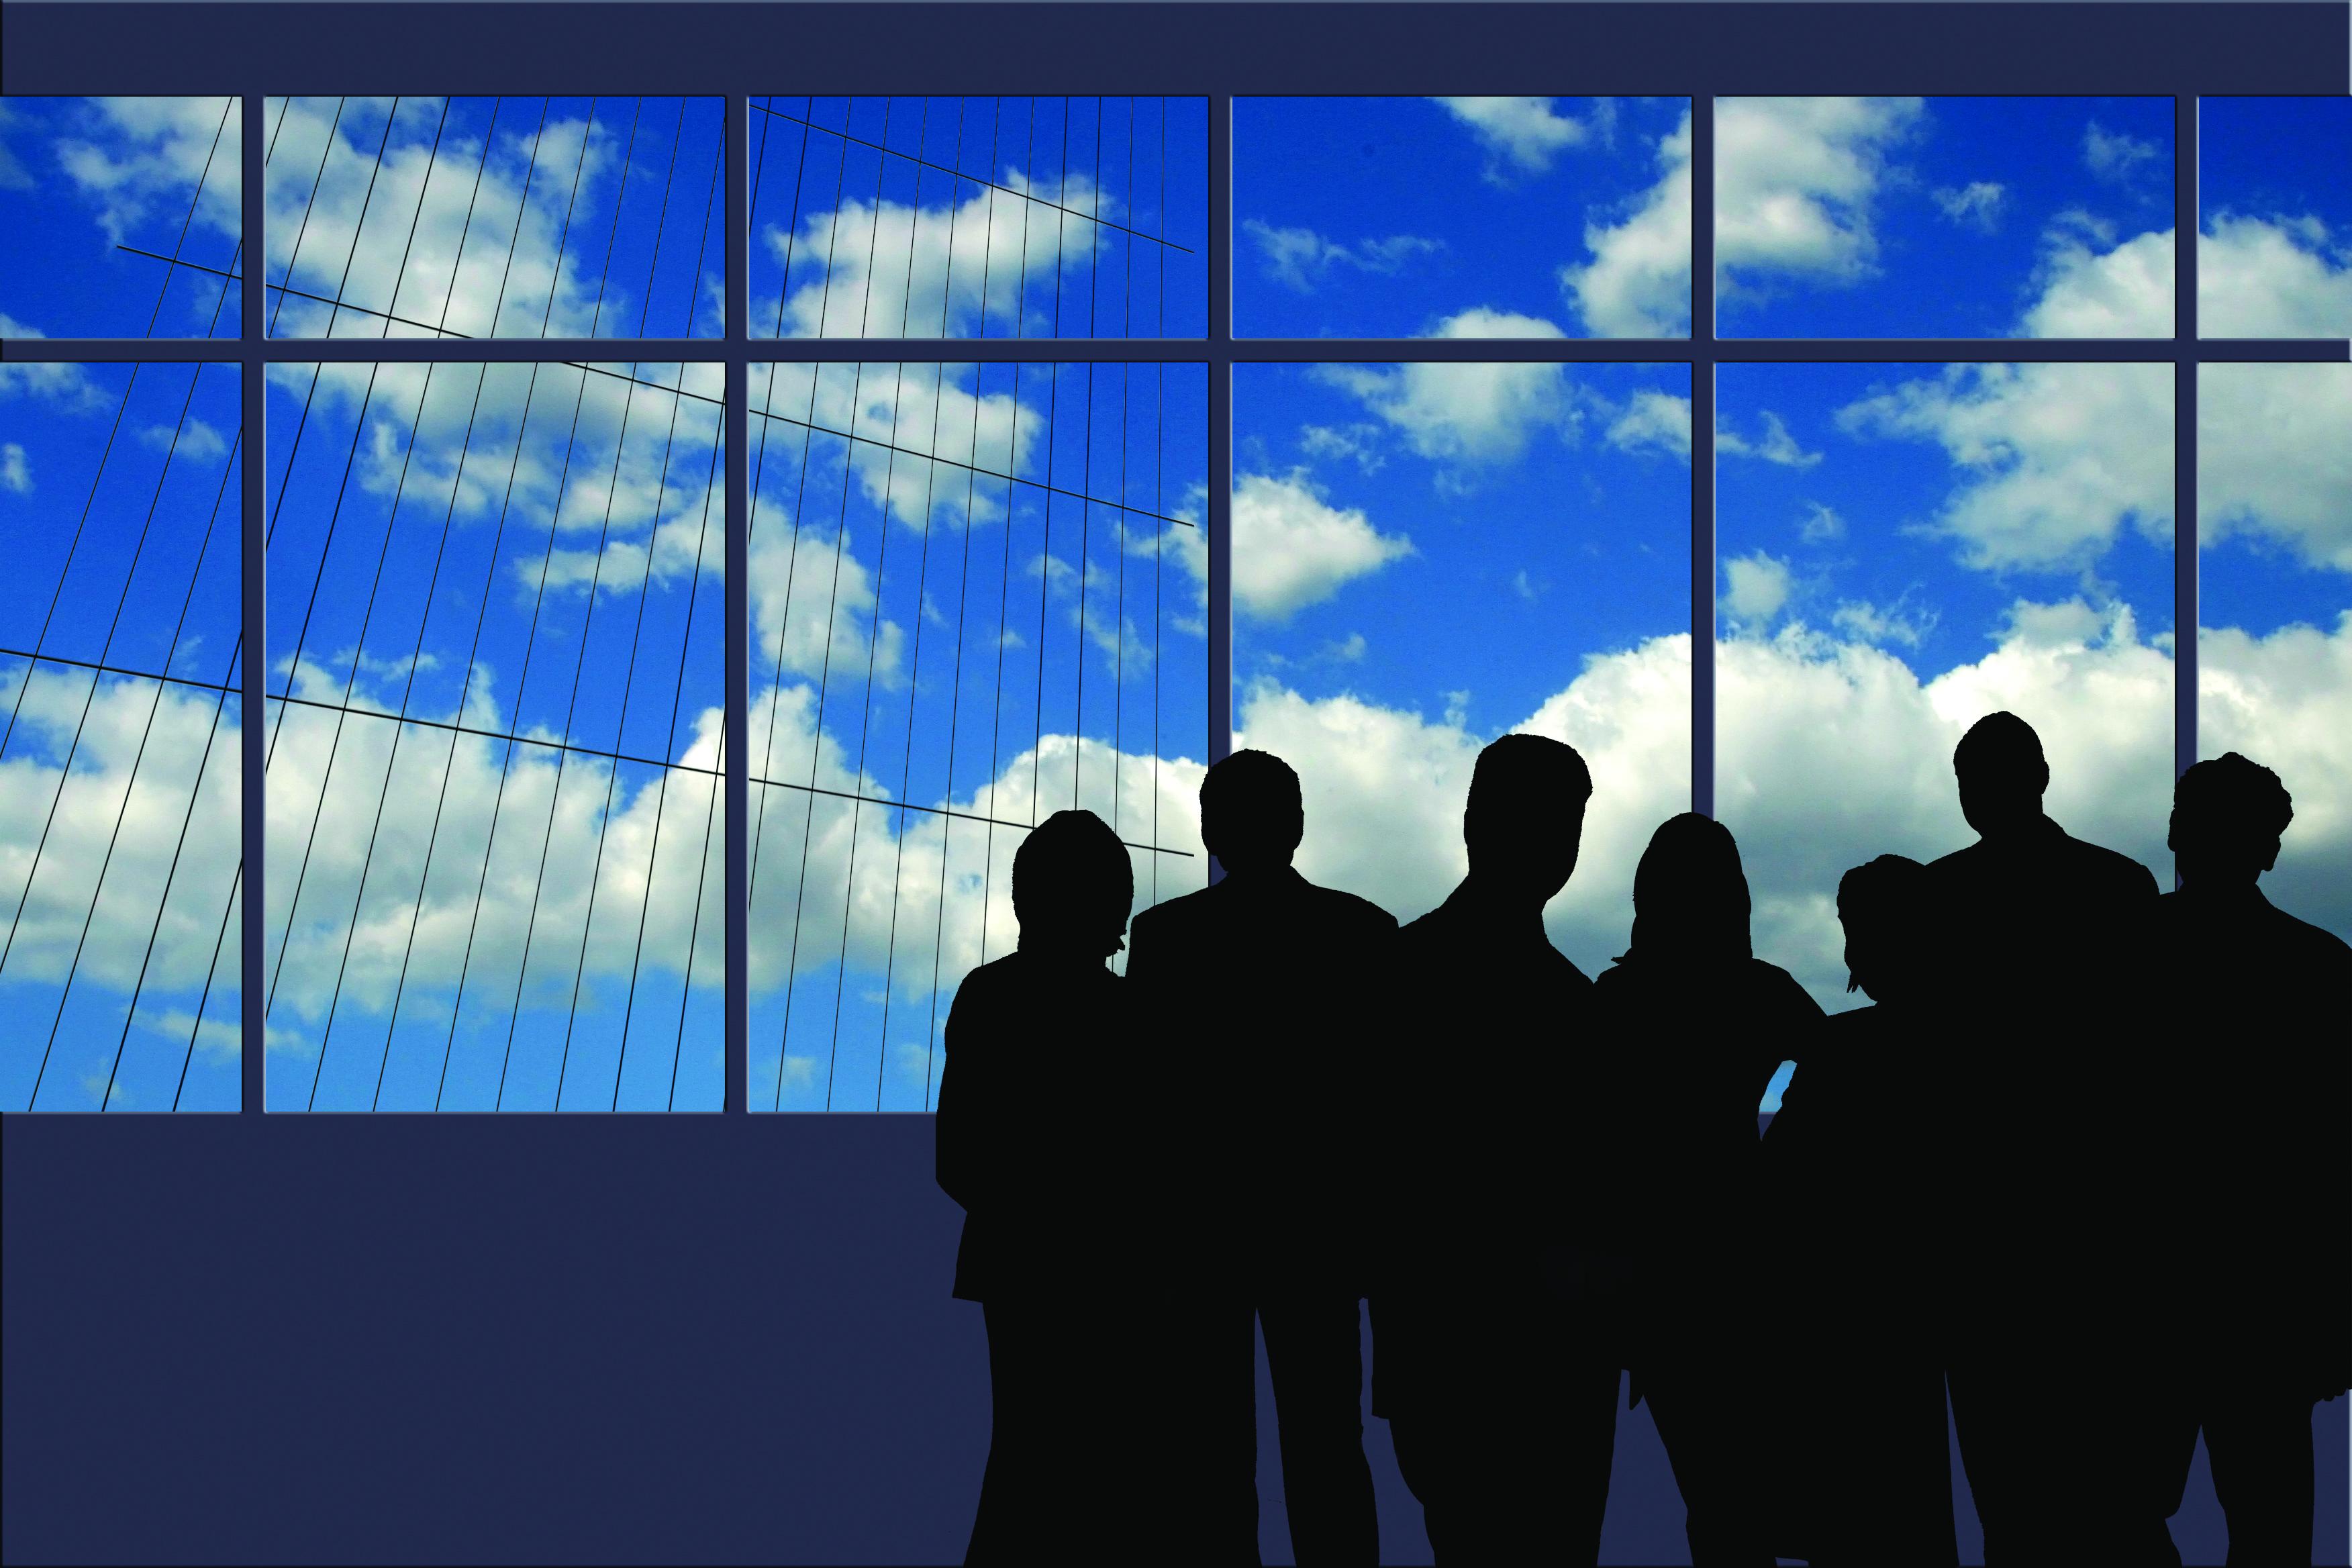 bigstock-A-Business-Team-silhouette-nex-26212253